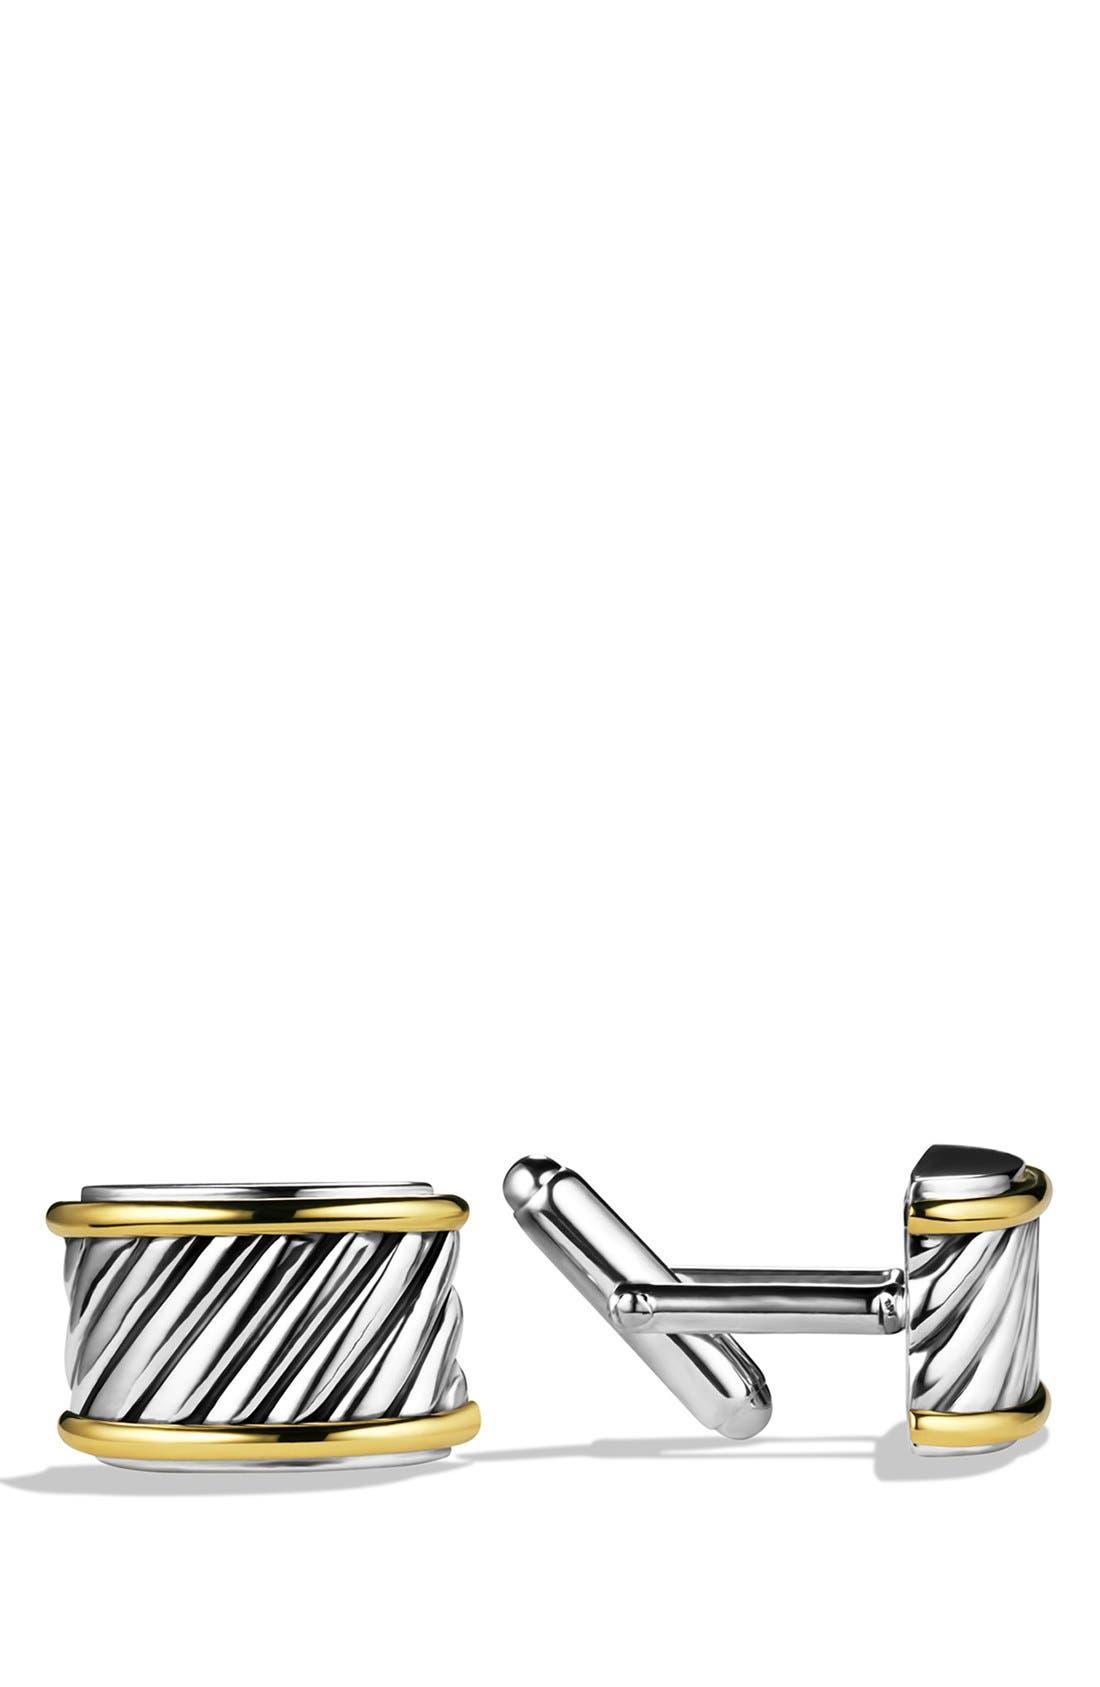 David Yurman 'Cable' Cigar Band Cuff Links with Gold